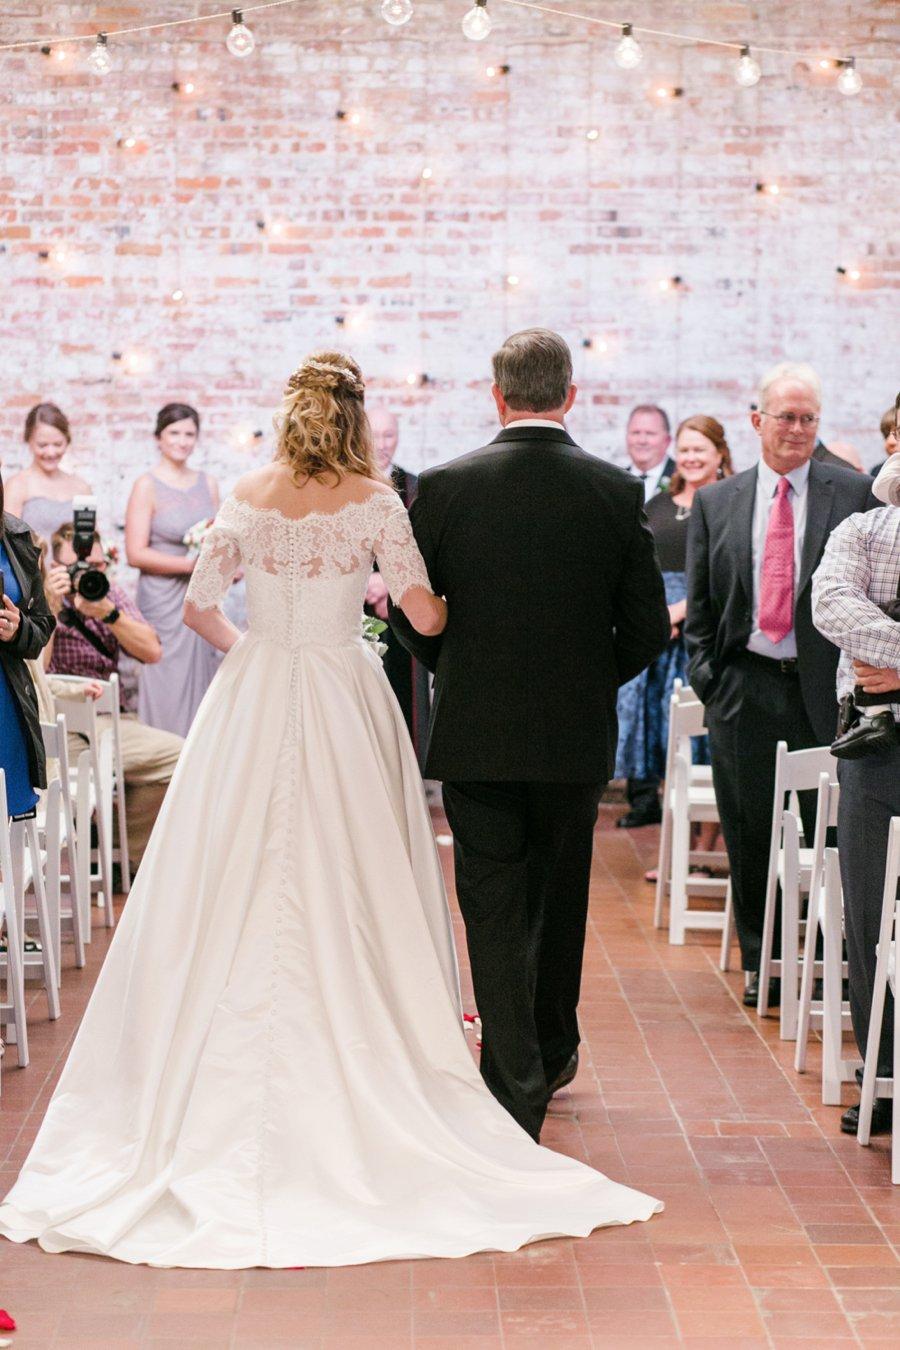 A Gray, Green, & Red Wintery North Carolina Wedding via TheELD.com